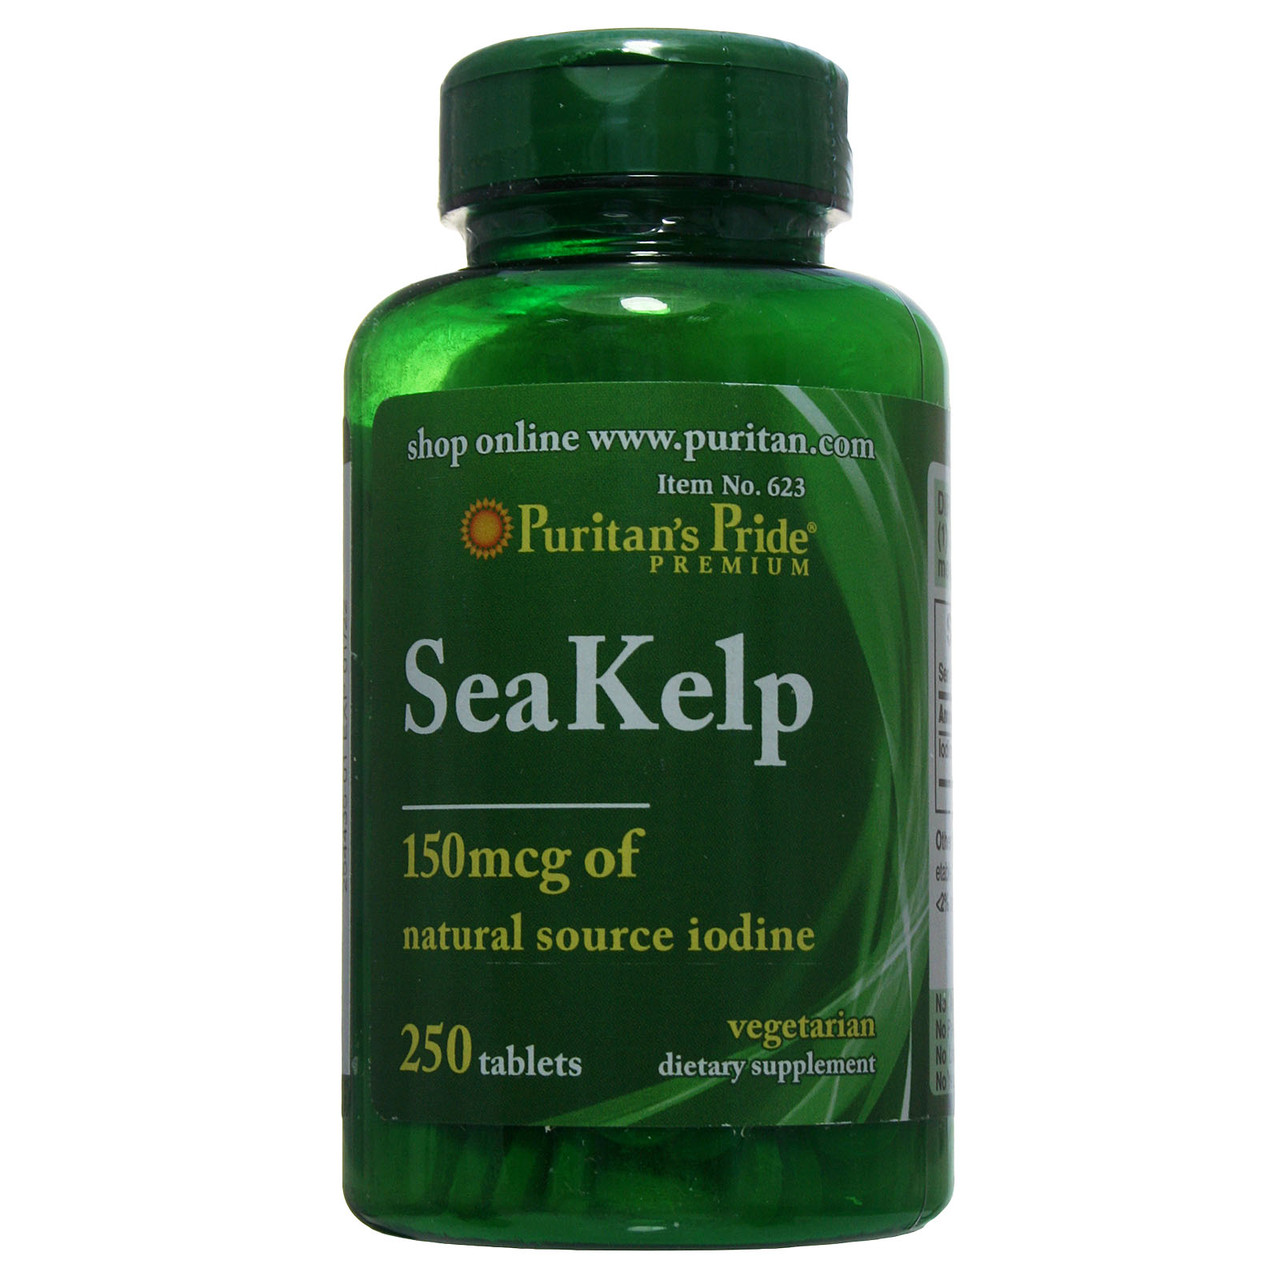 Келп, Sea Kelp, Puritan's Pride, 250 таблеток